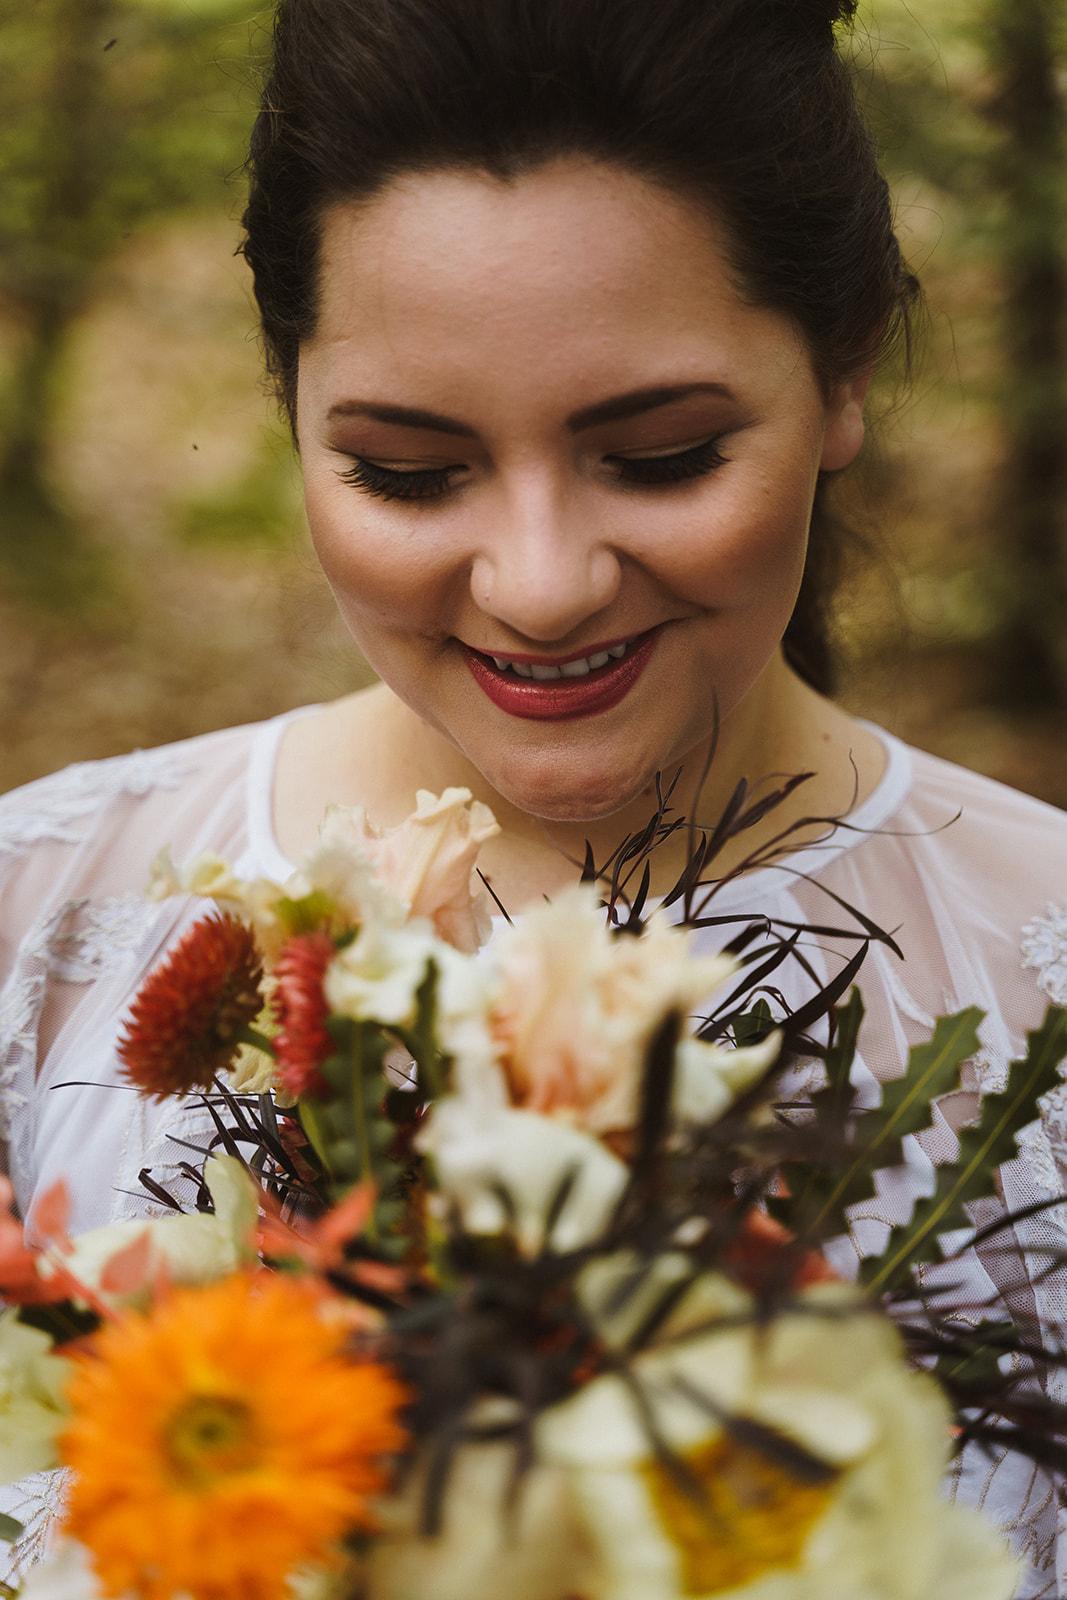 DSC00522_websize.Tuckaway Tree Farm Lebanon Maine Wedding Inspiration 36